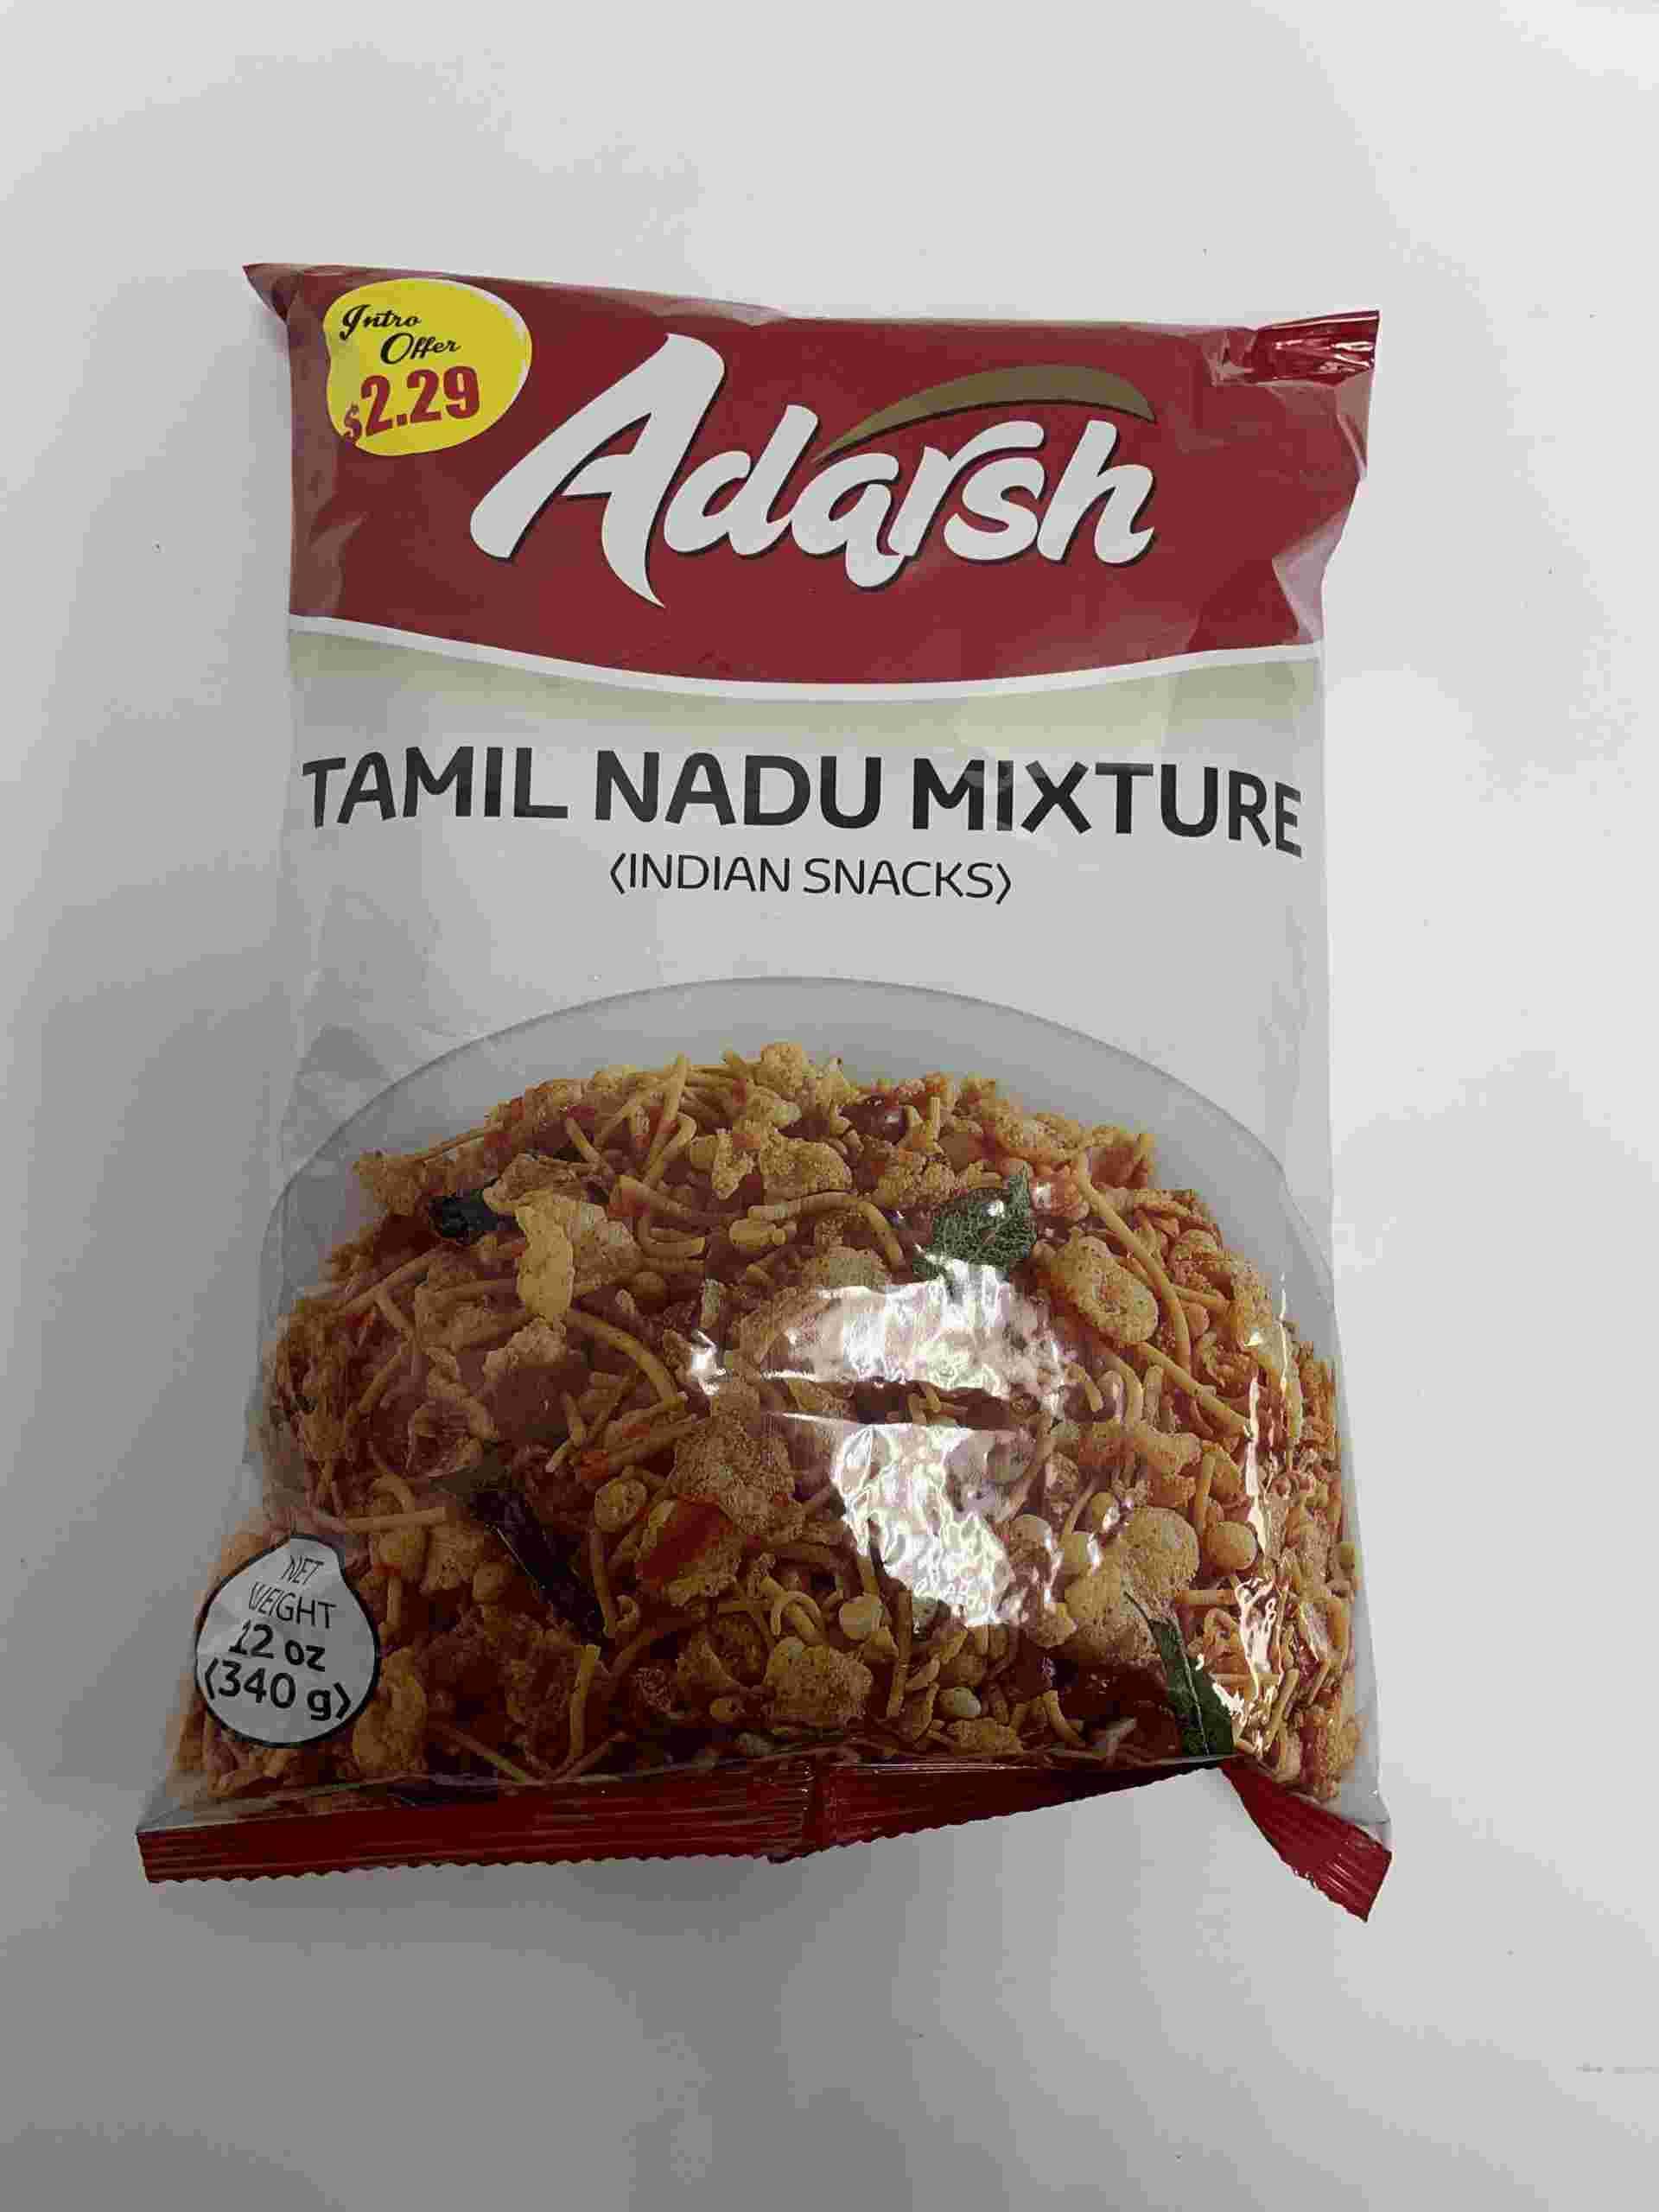 Adarsh Tamil Nadu Mixture